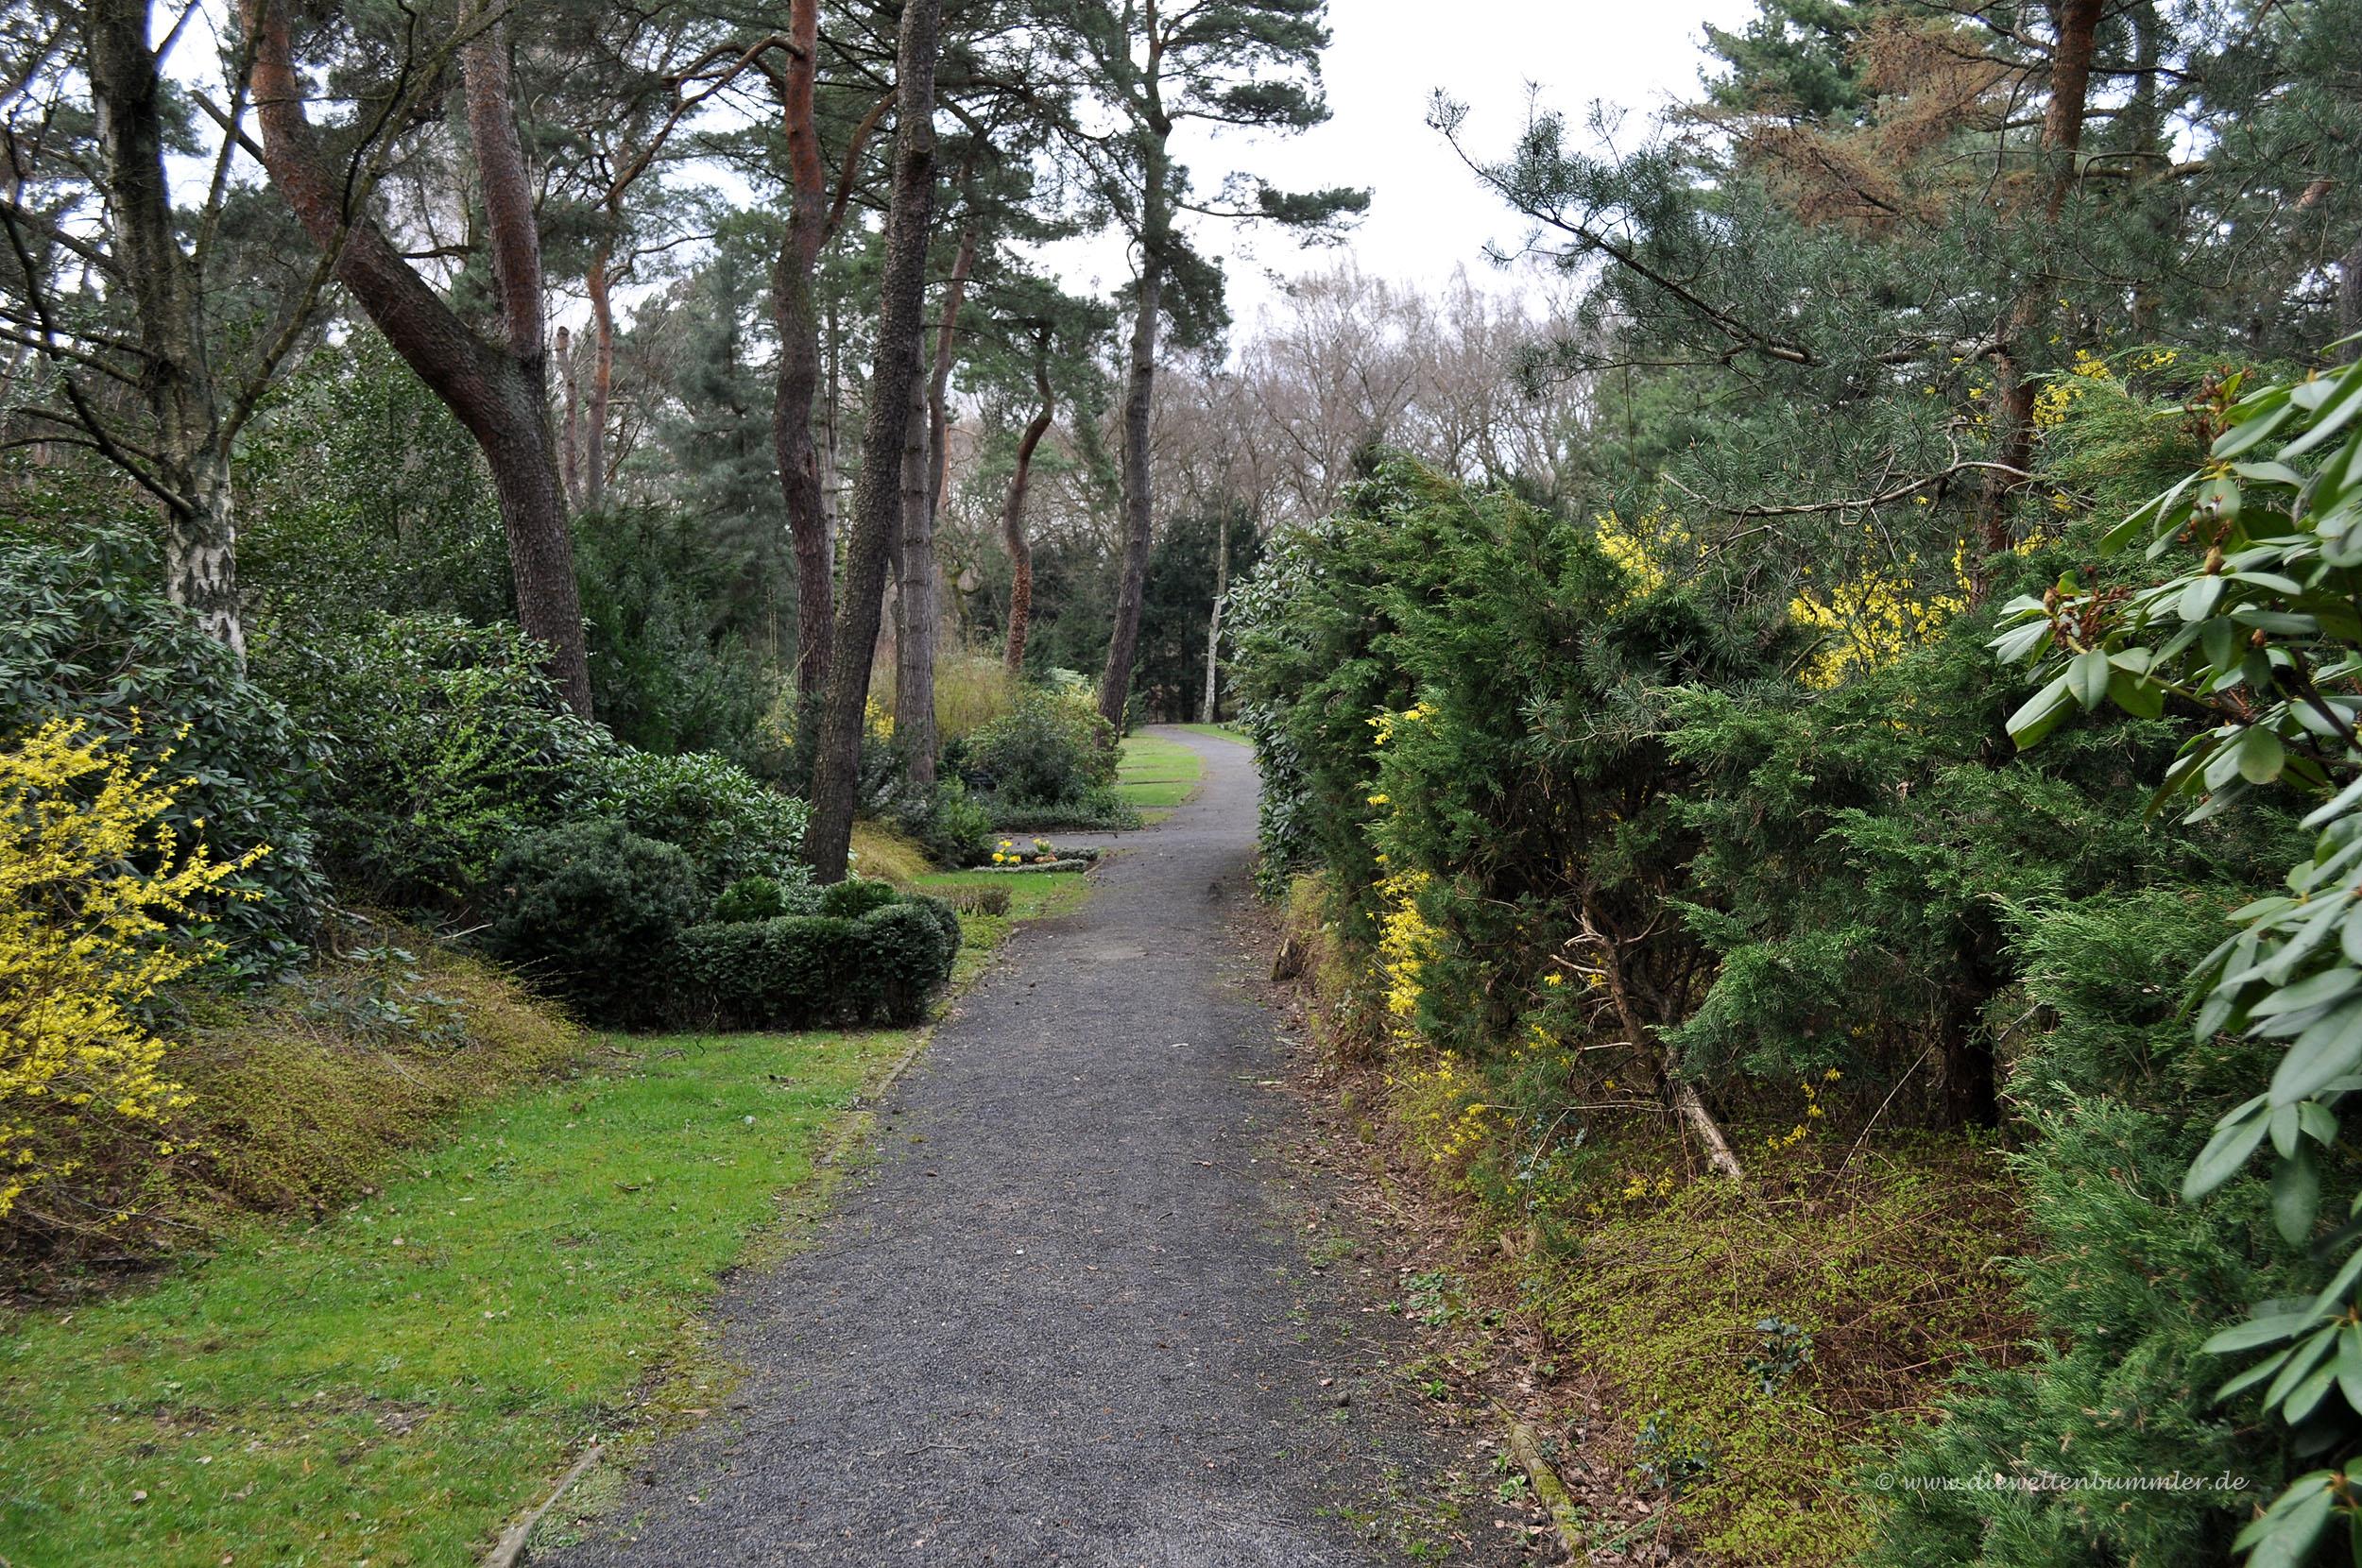 Spaziergang auf dem Friedhof